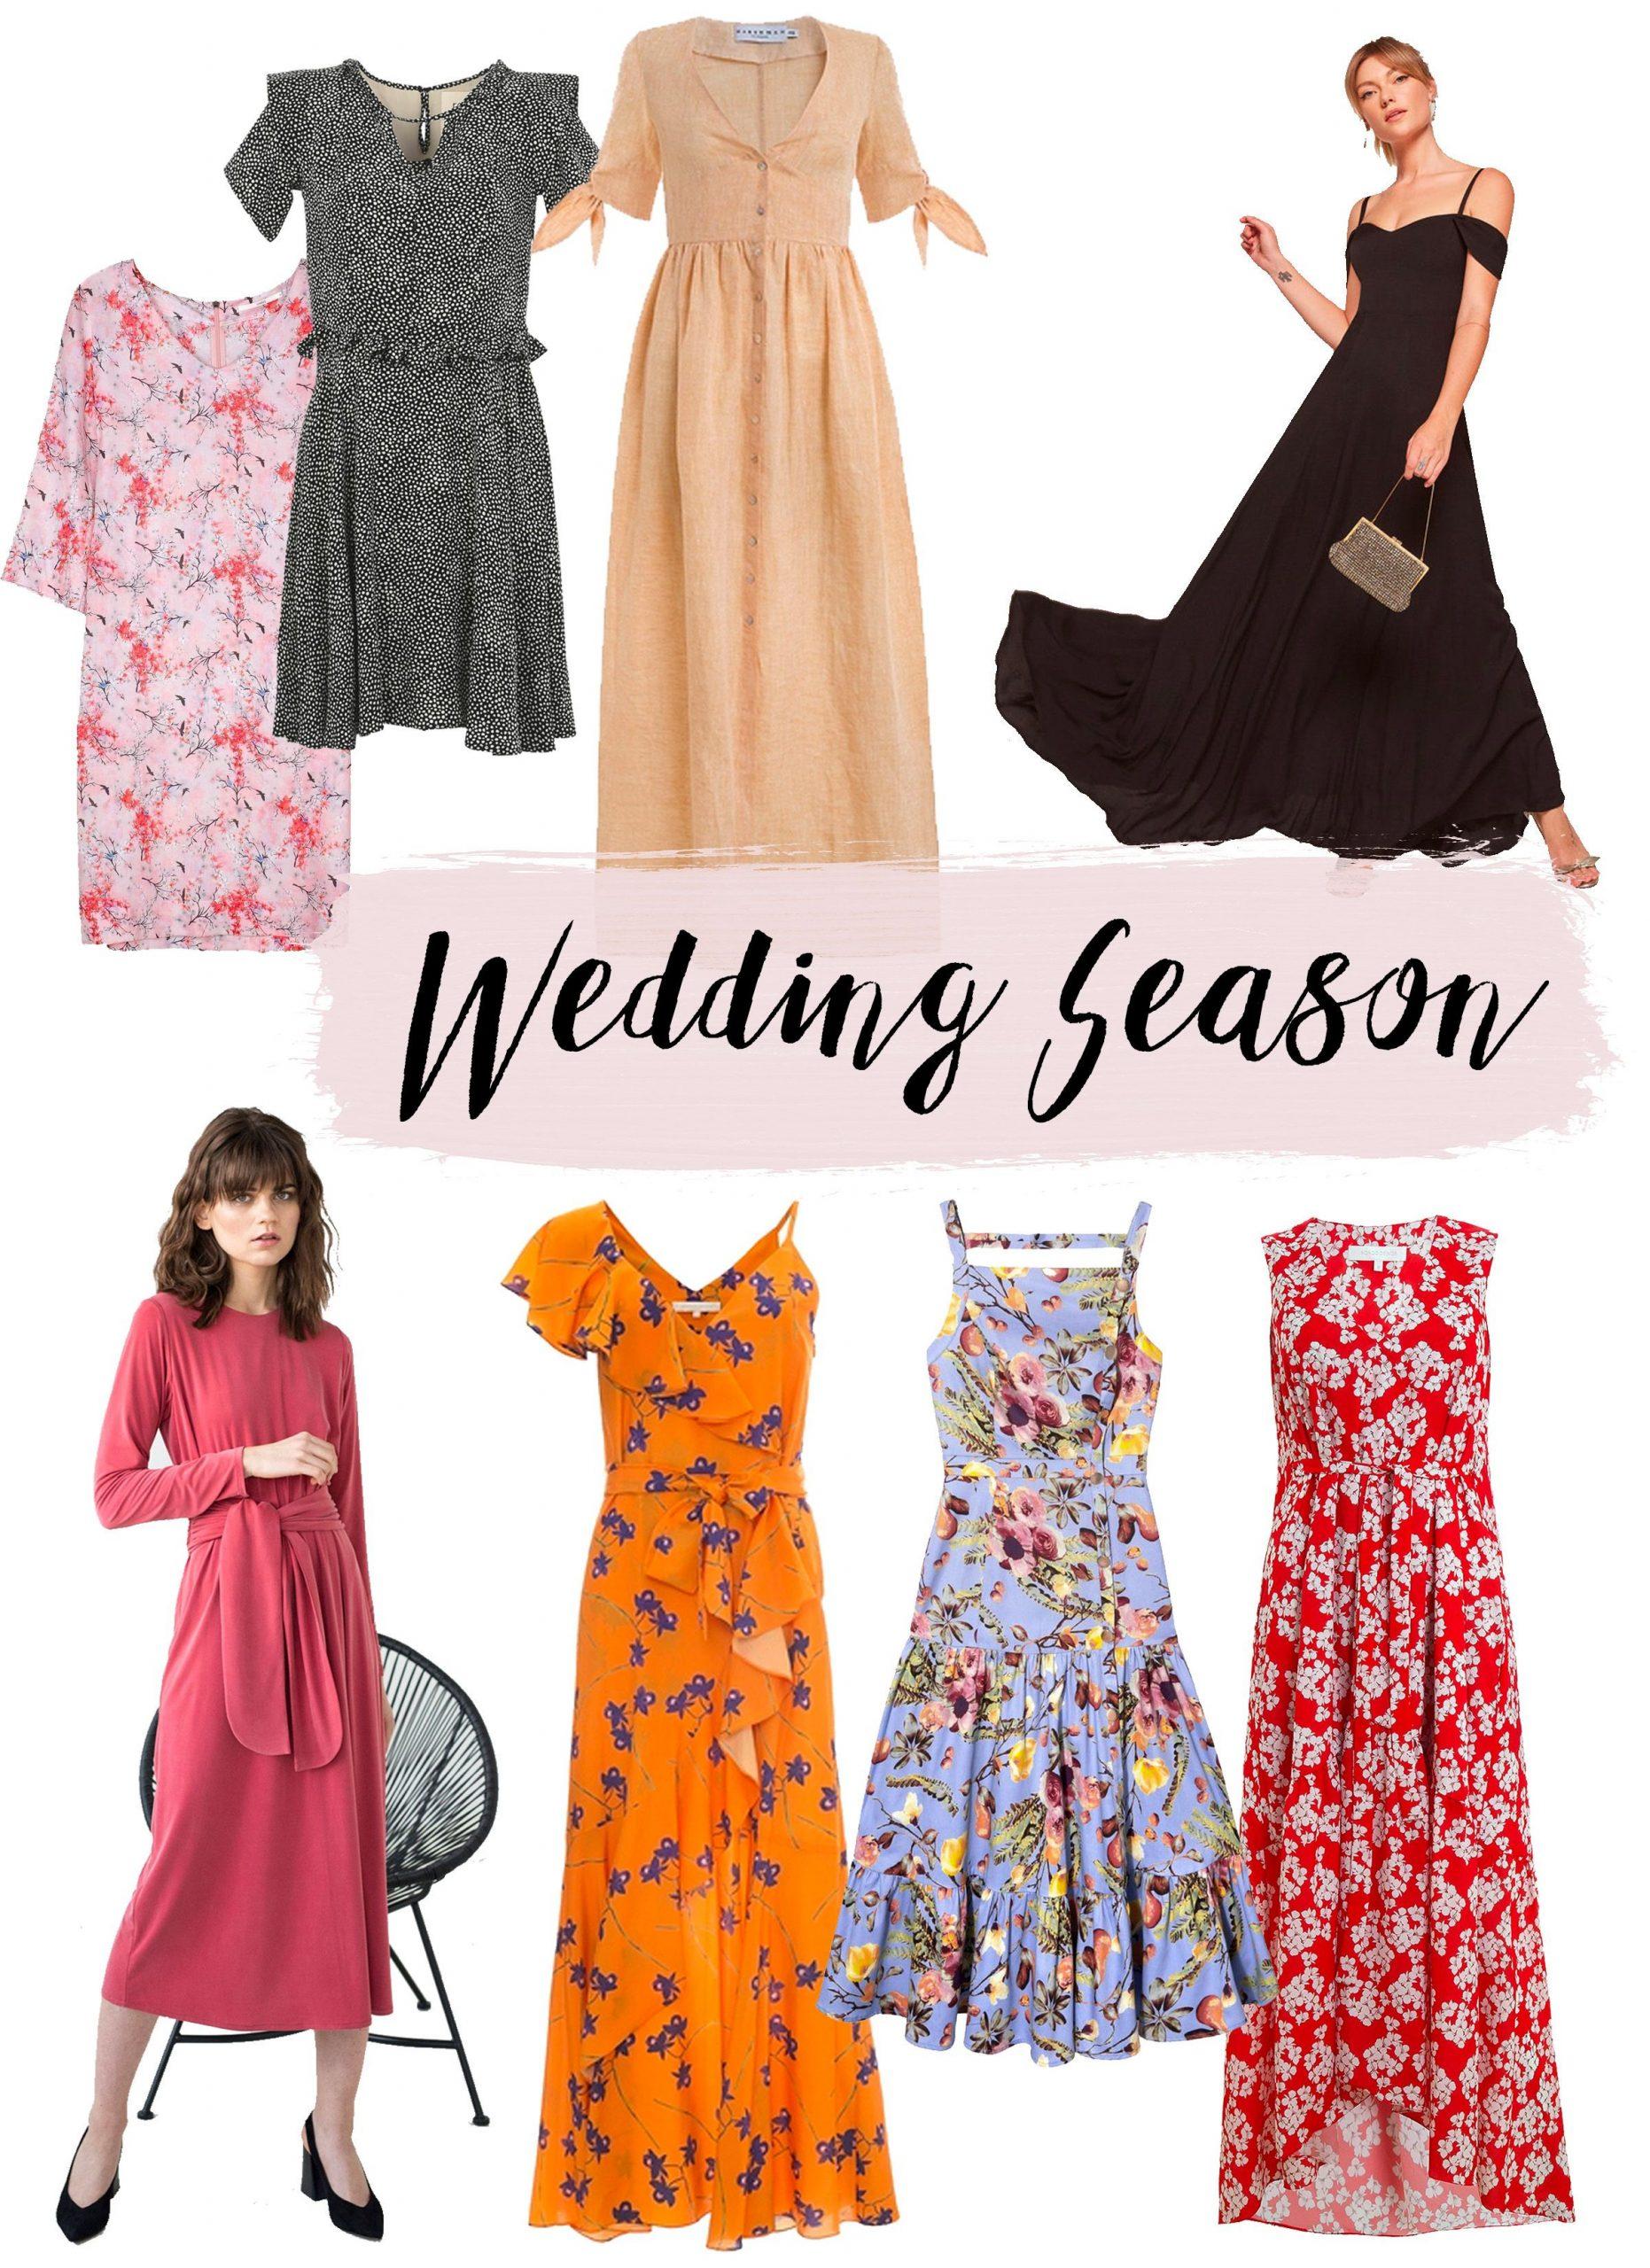 Mega Shopping Guide: Faire Hochzeitsgastkleider